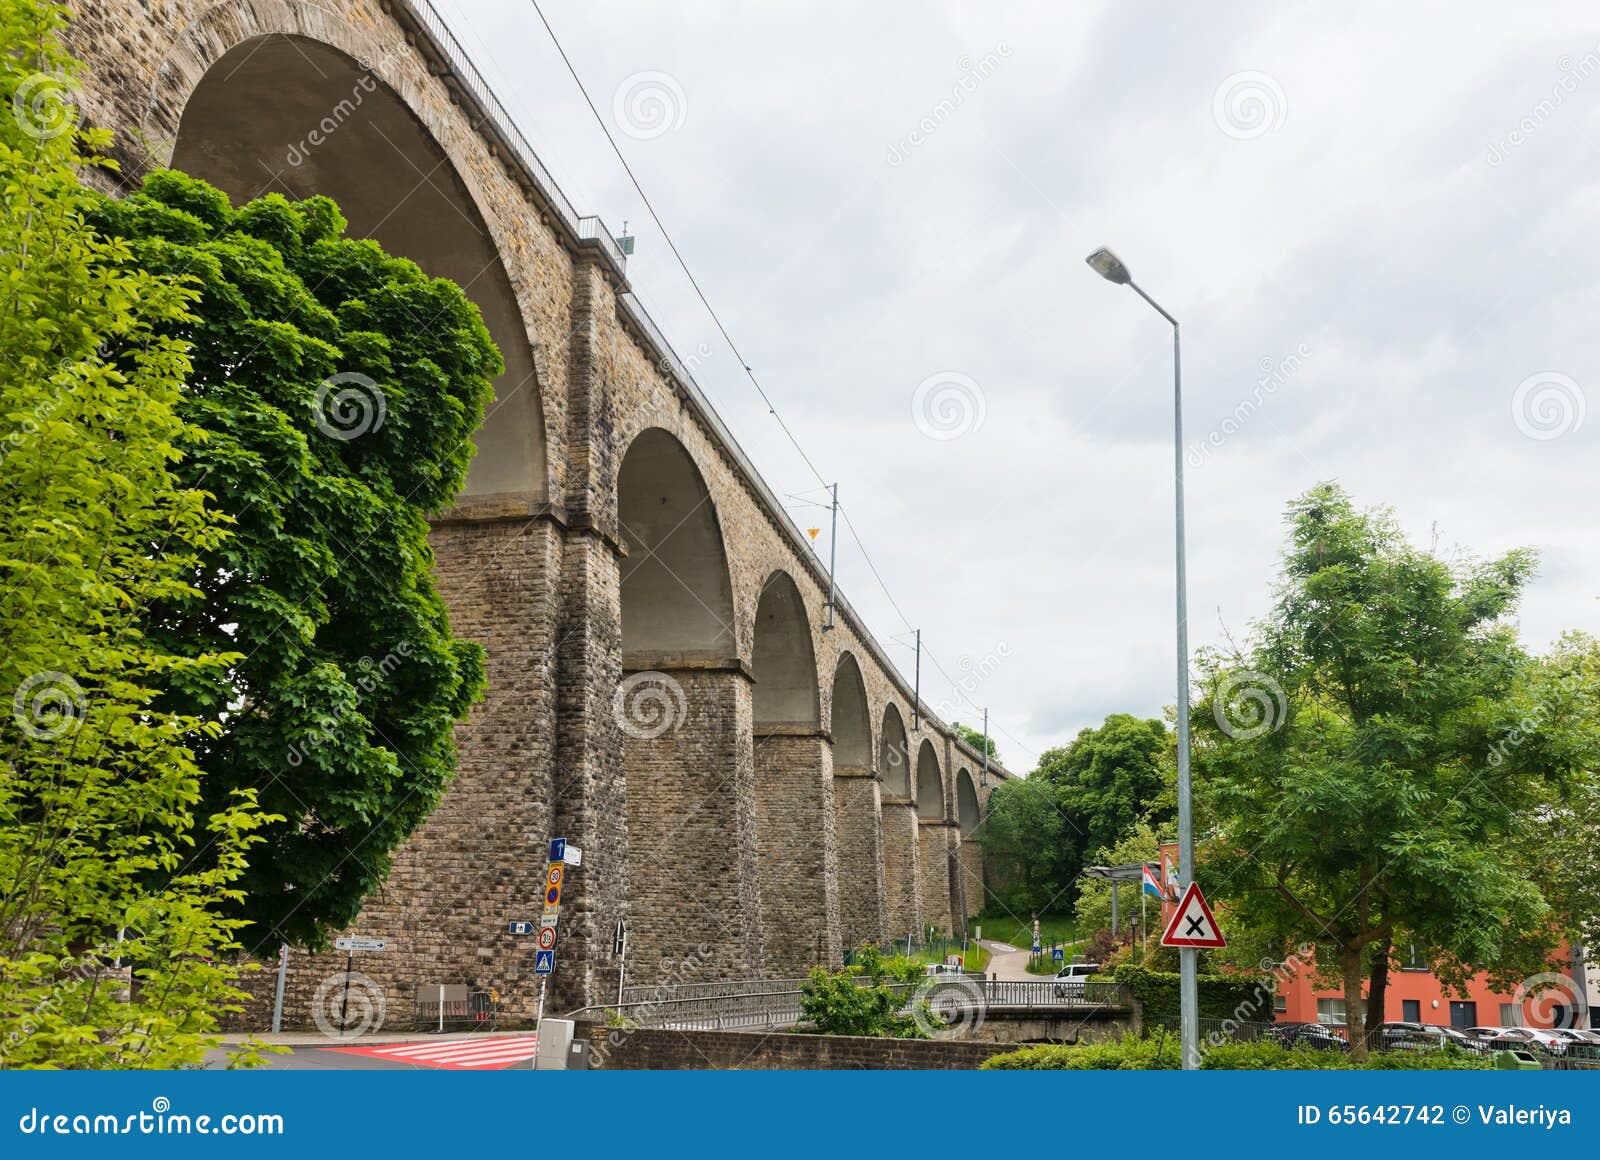 Viaduc du luxembourgeois